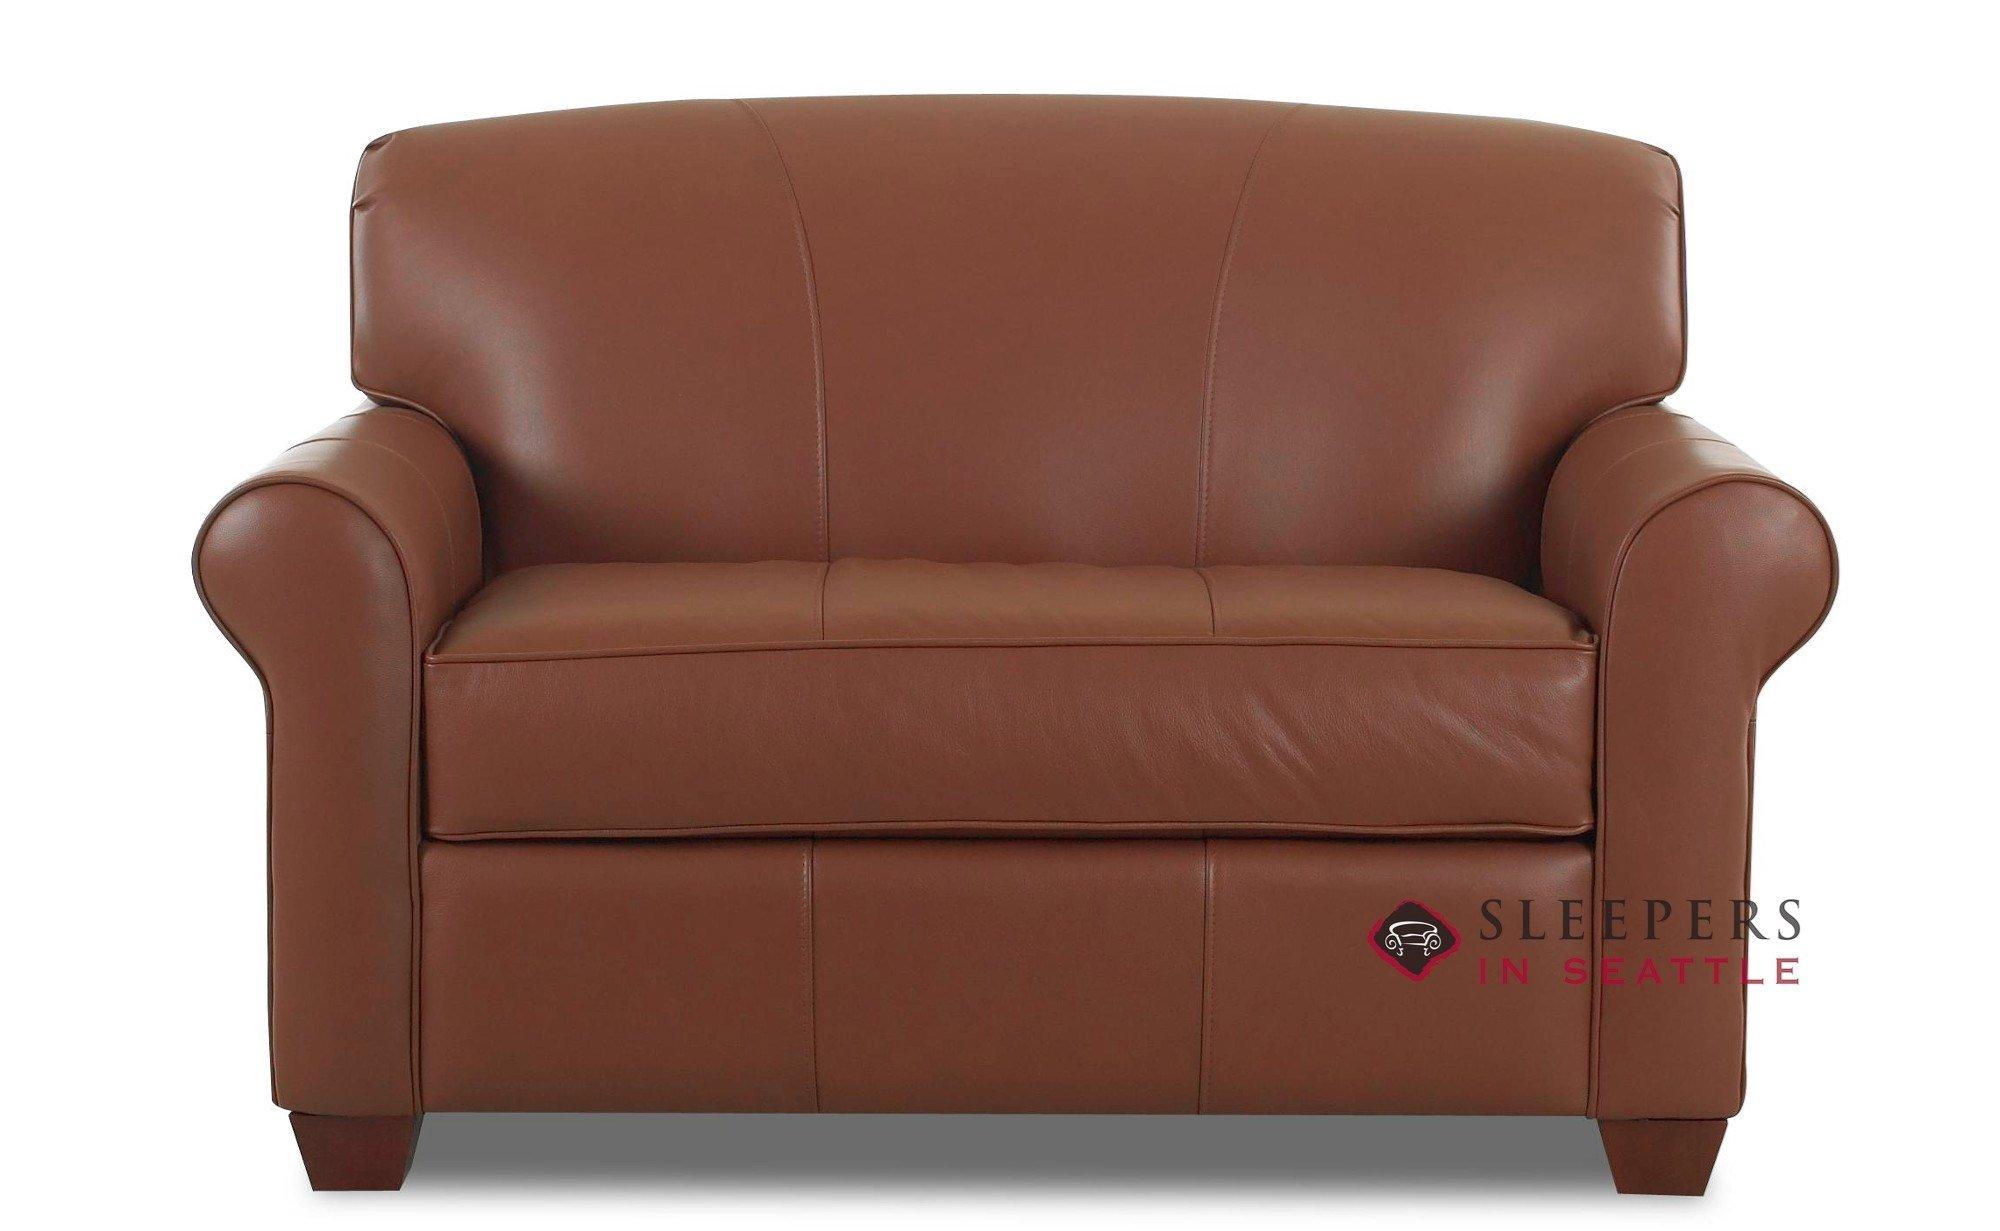 Wondrous Savvy Calgary Leather Chair Sleeper Sofa Short Links Chair Design For Home Short Linksinfo